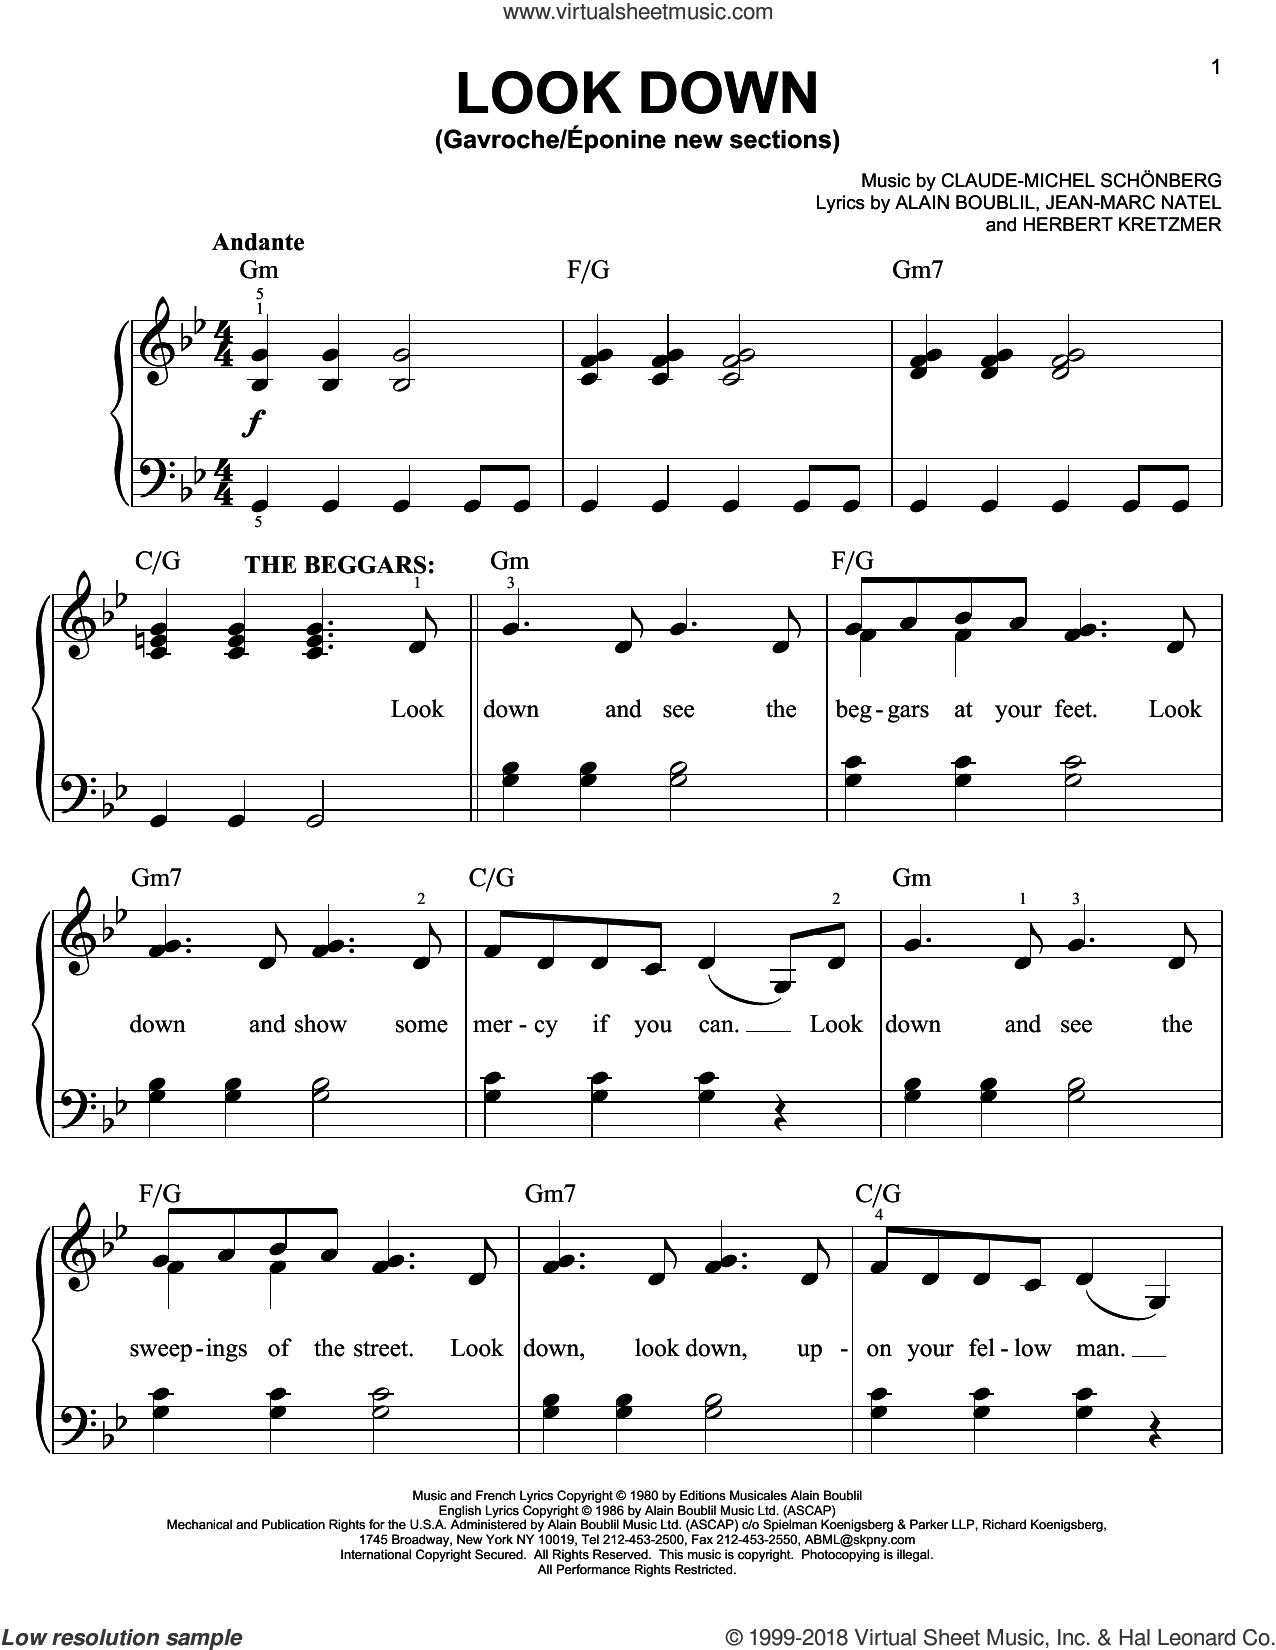 Look Down (Gavroche) sheet music for piano solo by Claude-Michel Schonberg, Alain Boublil and Herbert Kretzmer, easy skill level